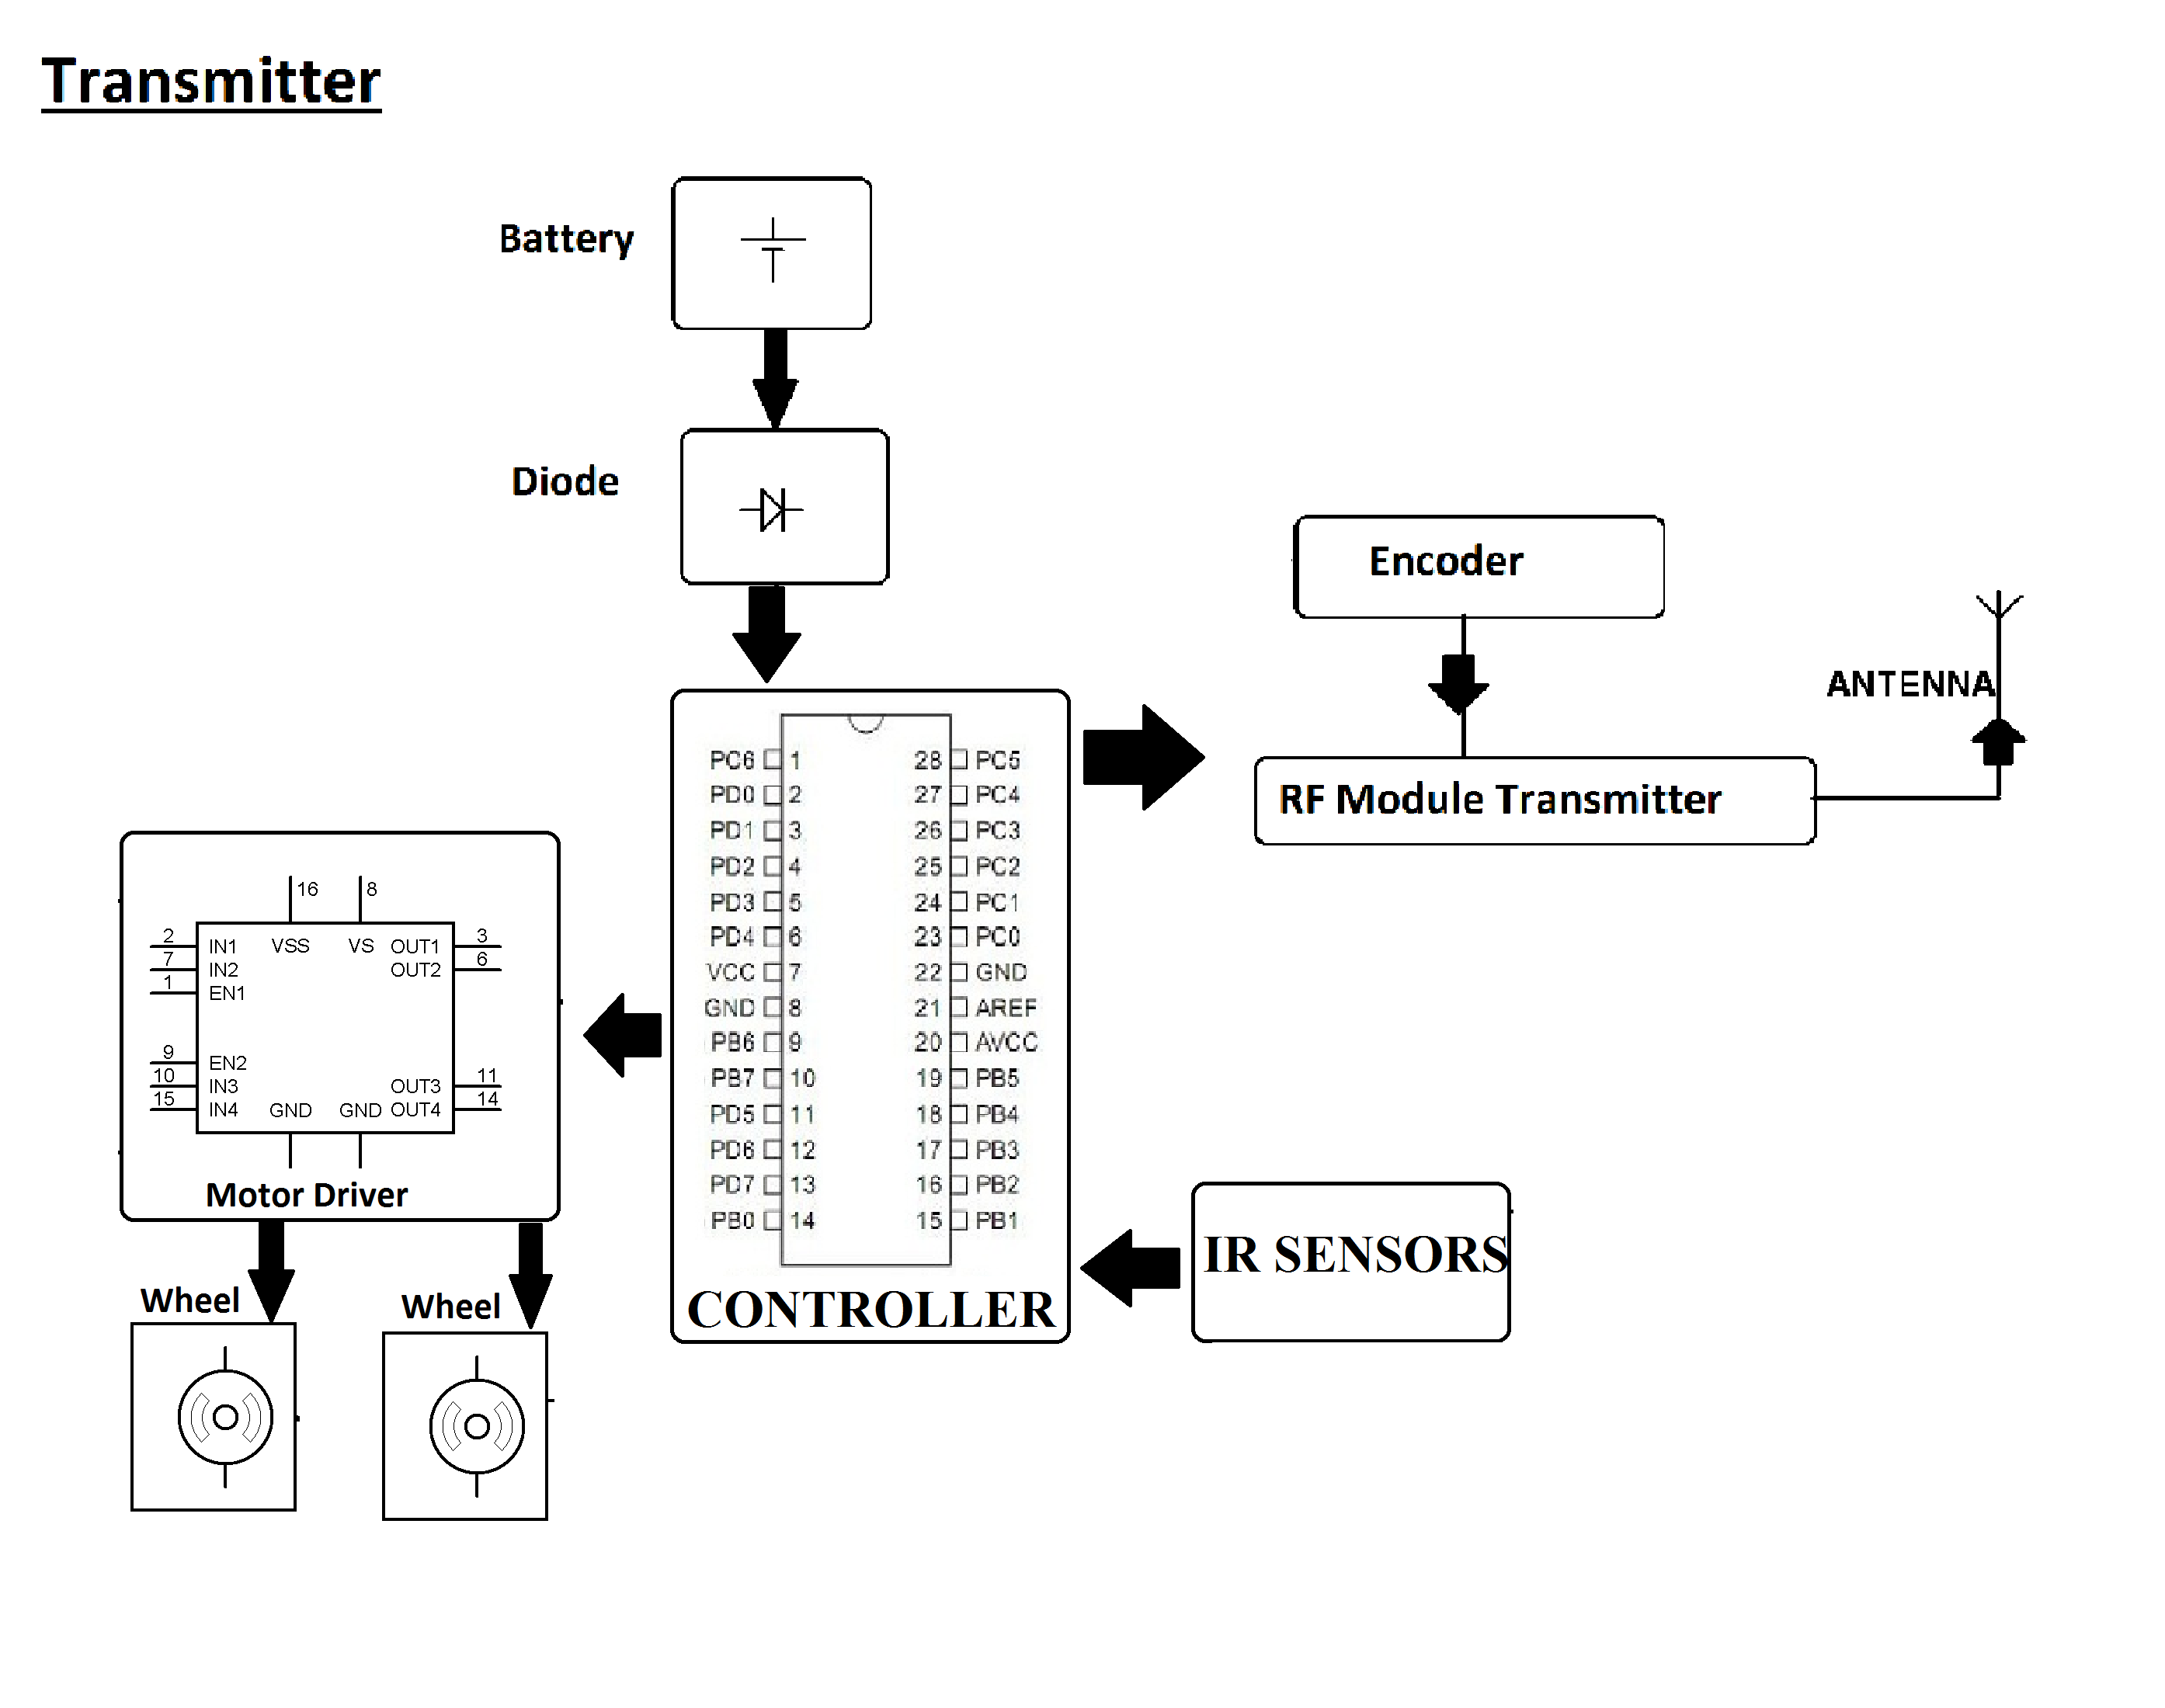 circuit diagram of zigbee multi robot coordination for swarm robotics  multi robot coordination for swarm robotics